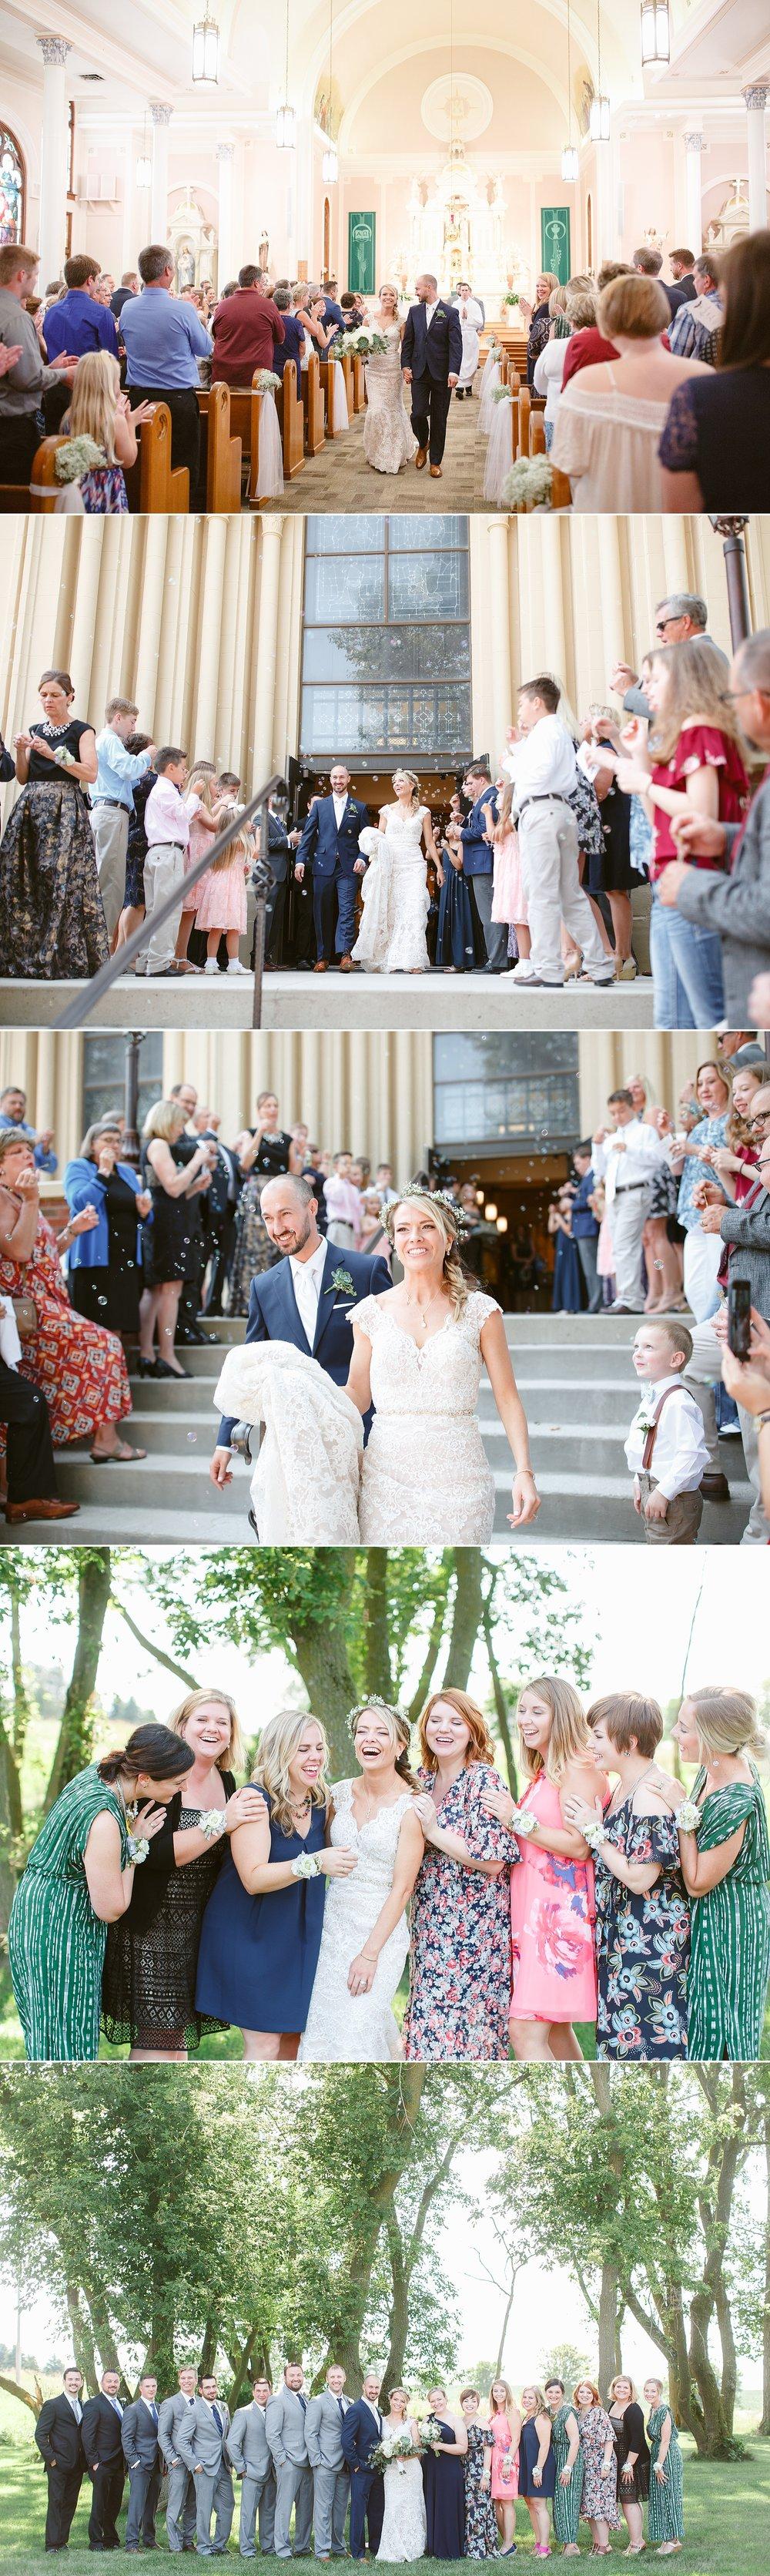 Midwest fine art wedding Des Moines Fall Wedding photographer_0681.jpg